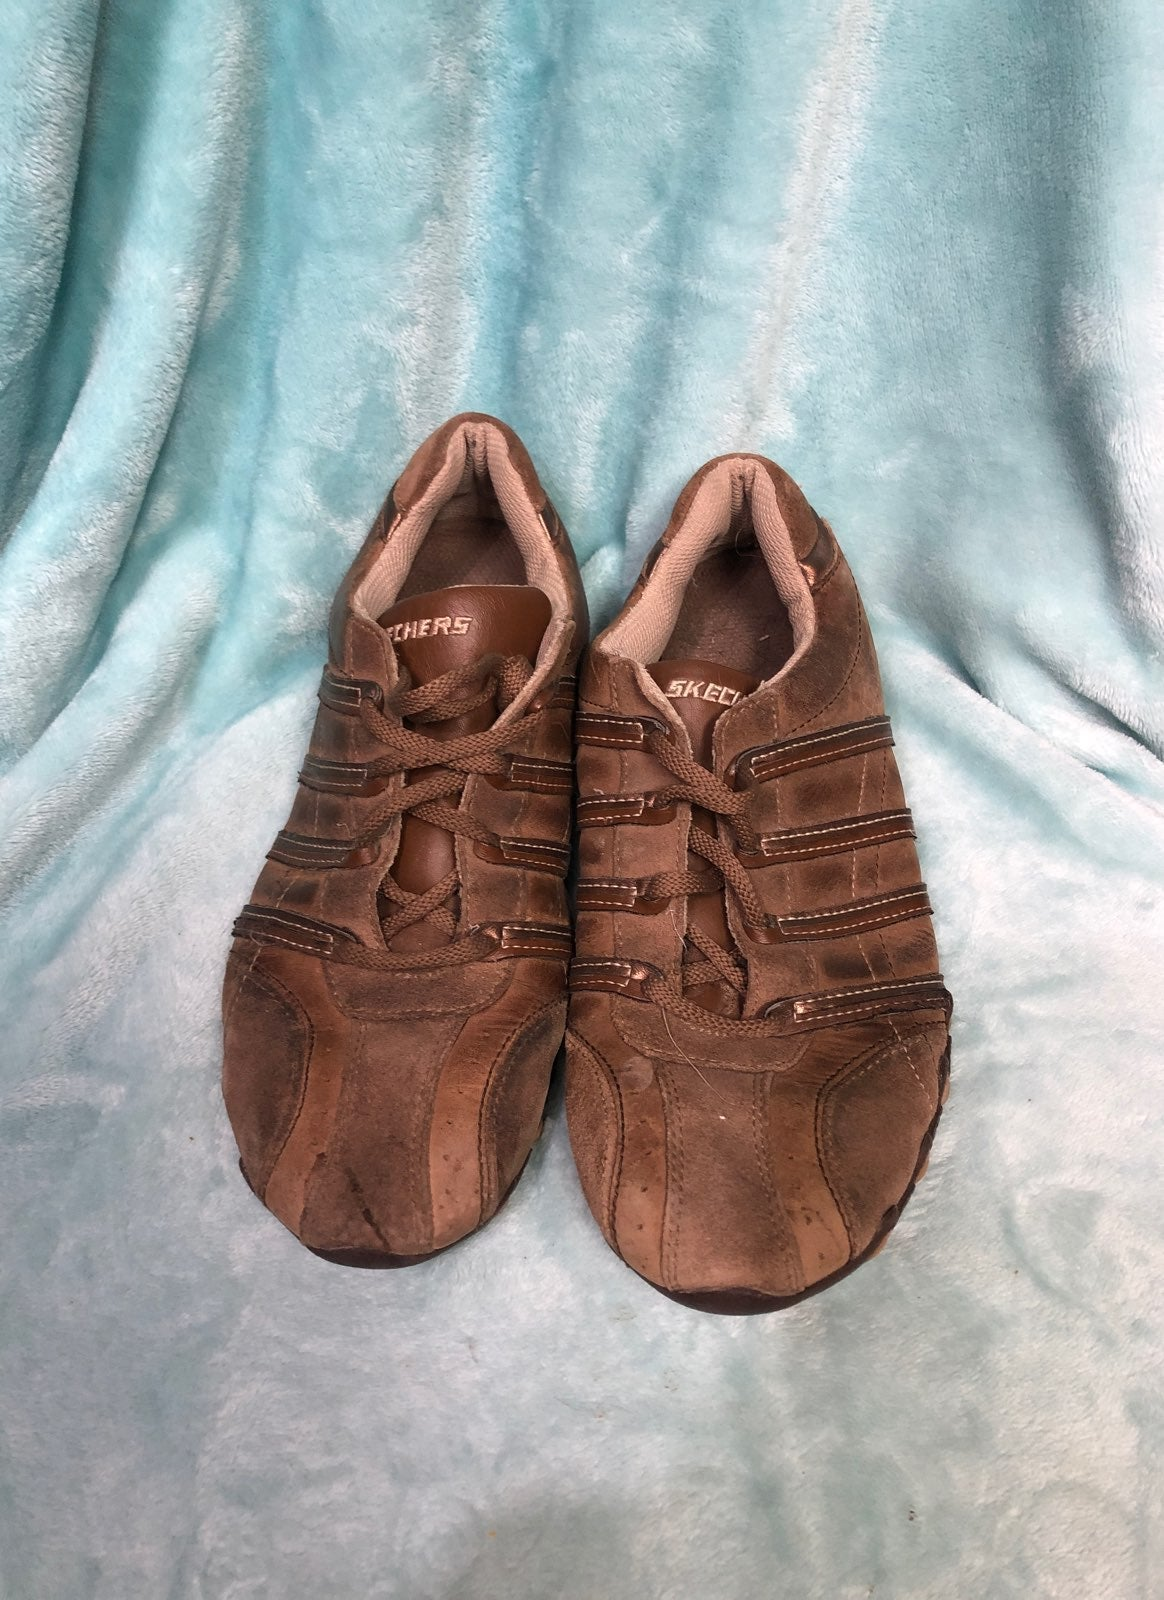 SKECHERS Genuine Leather Shoes | Mercari